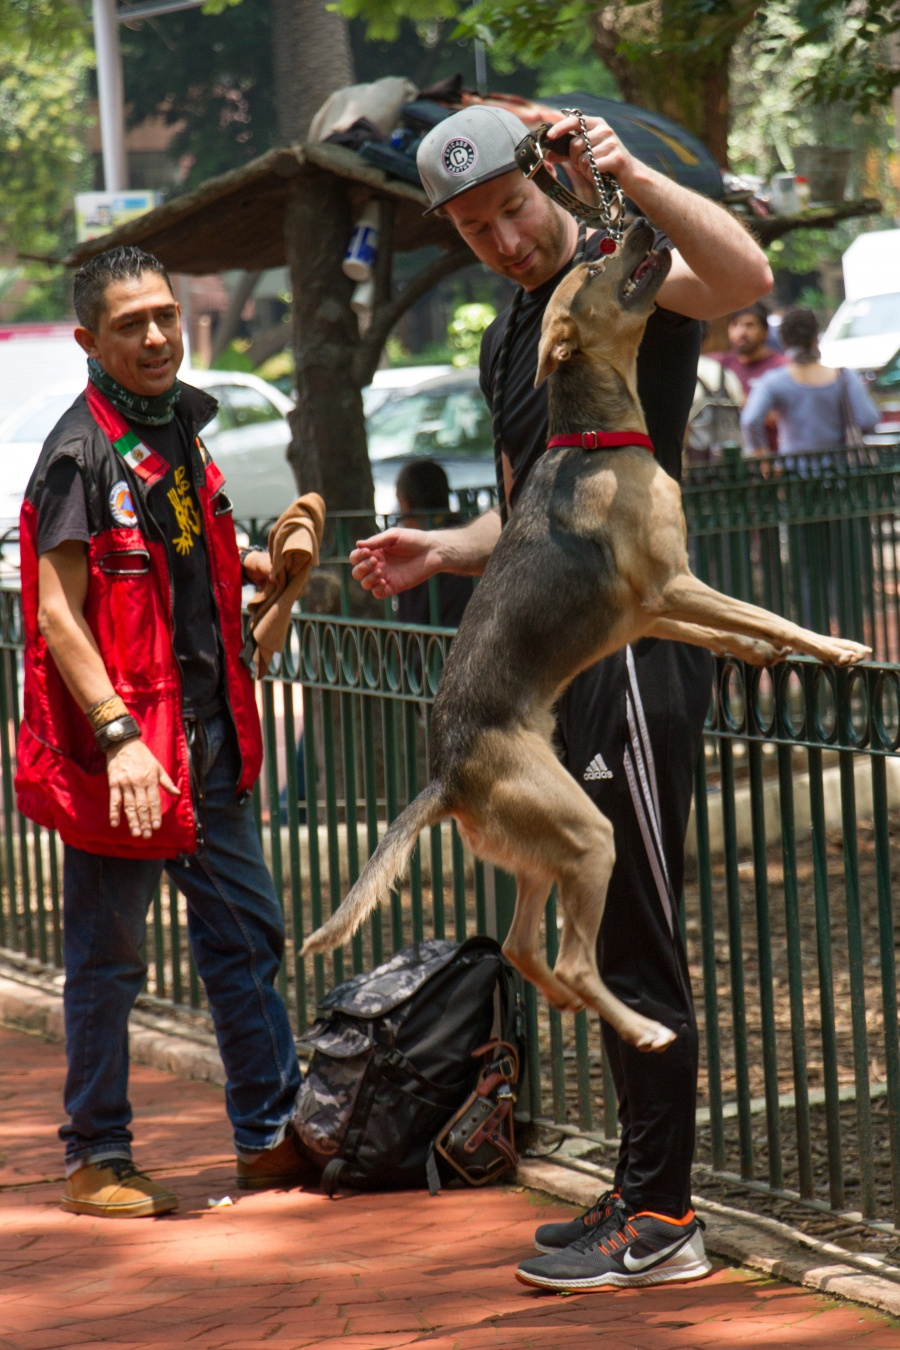 Aprueban reforma para evitar maltrato de las mascotas